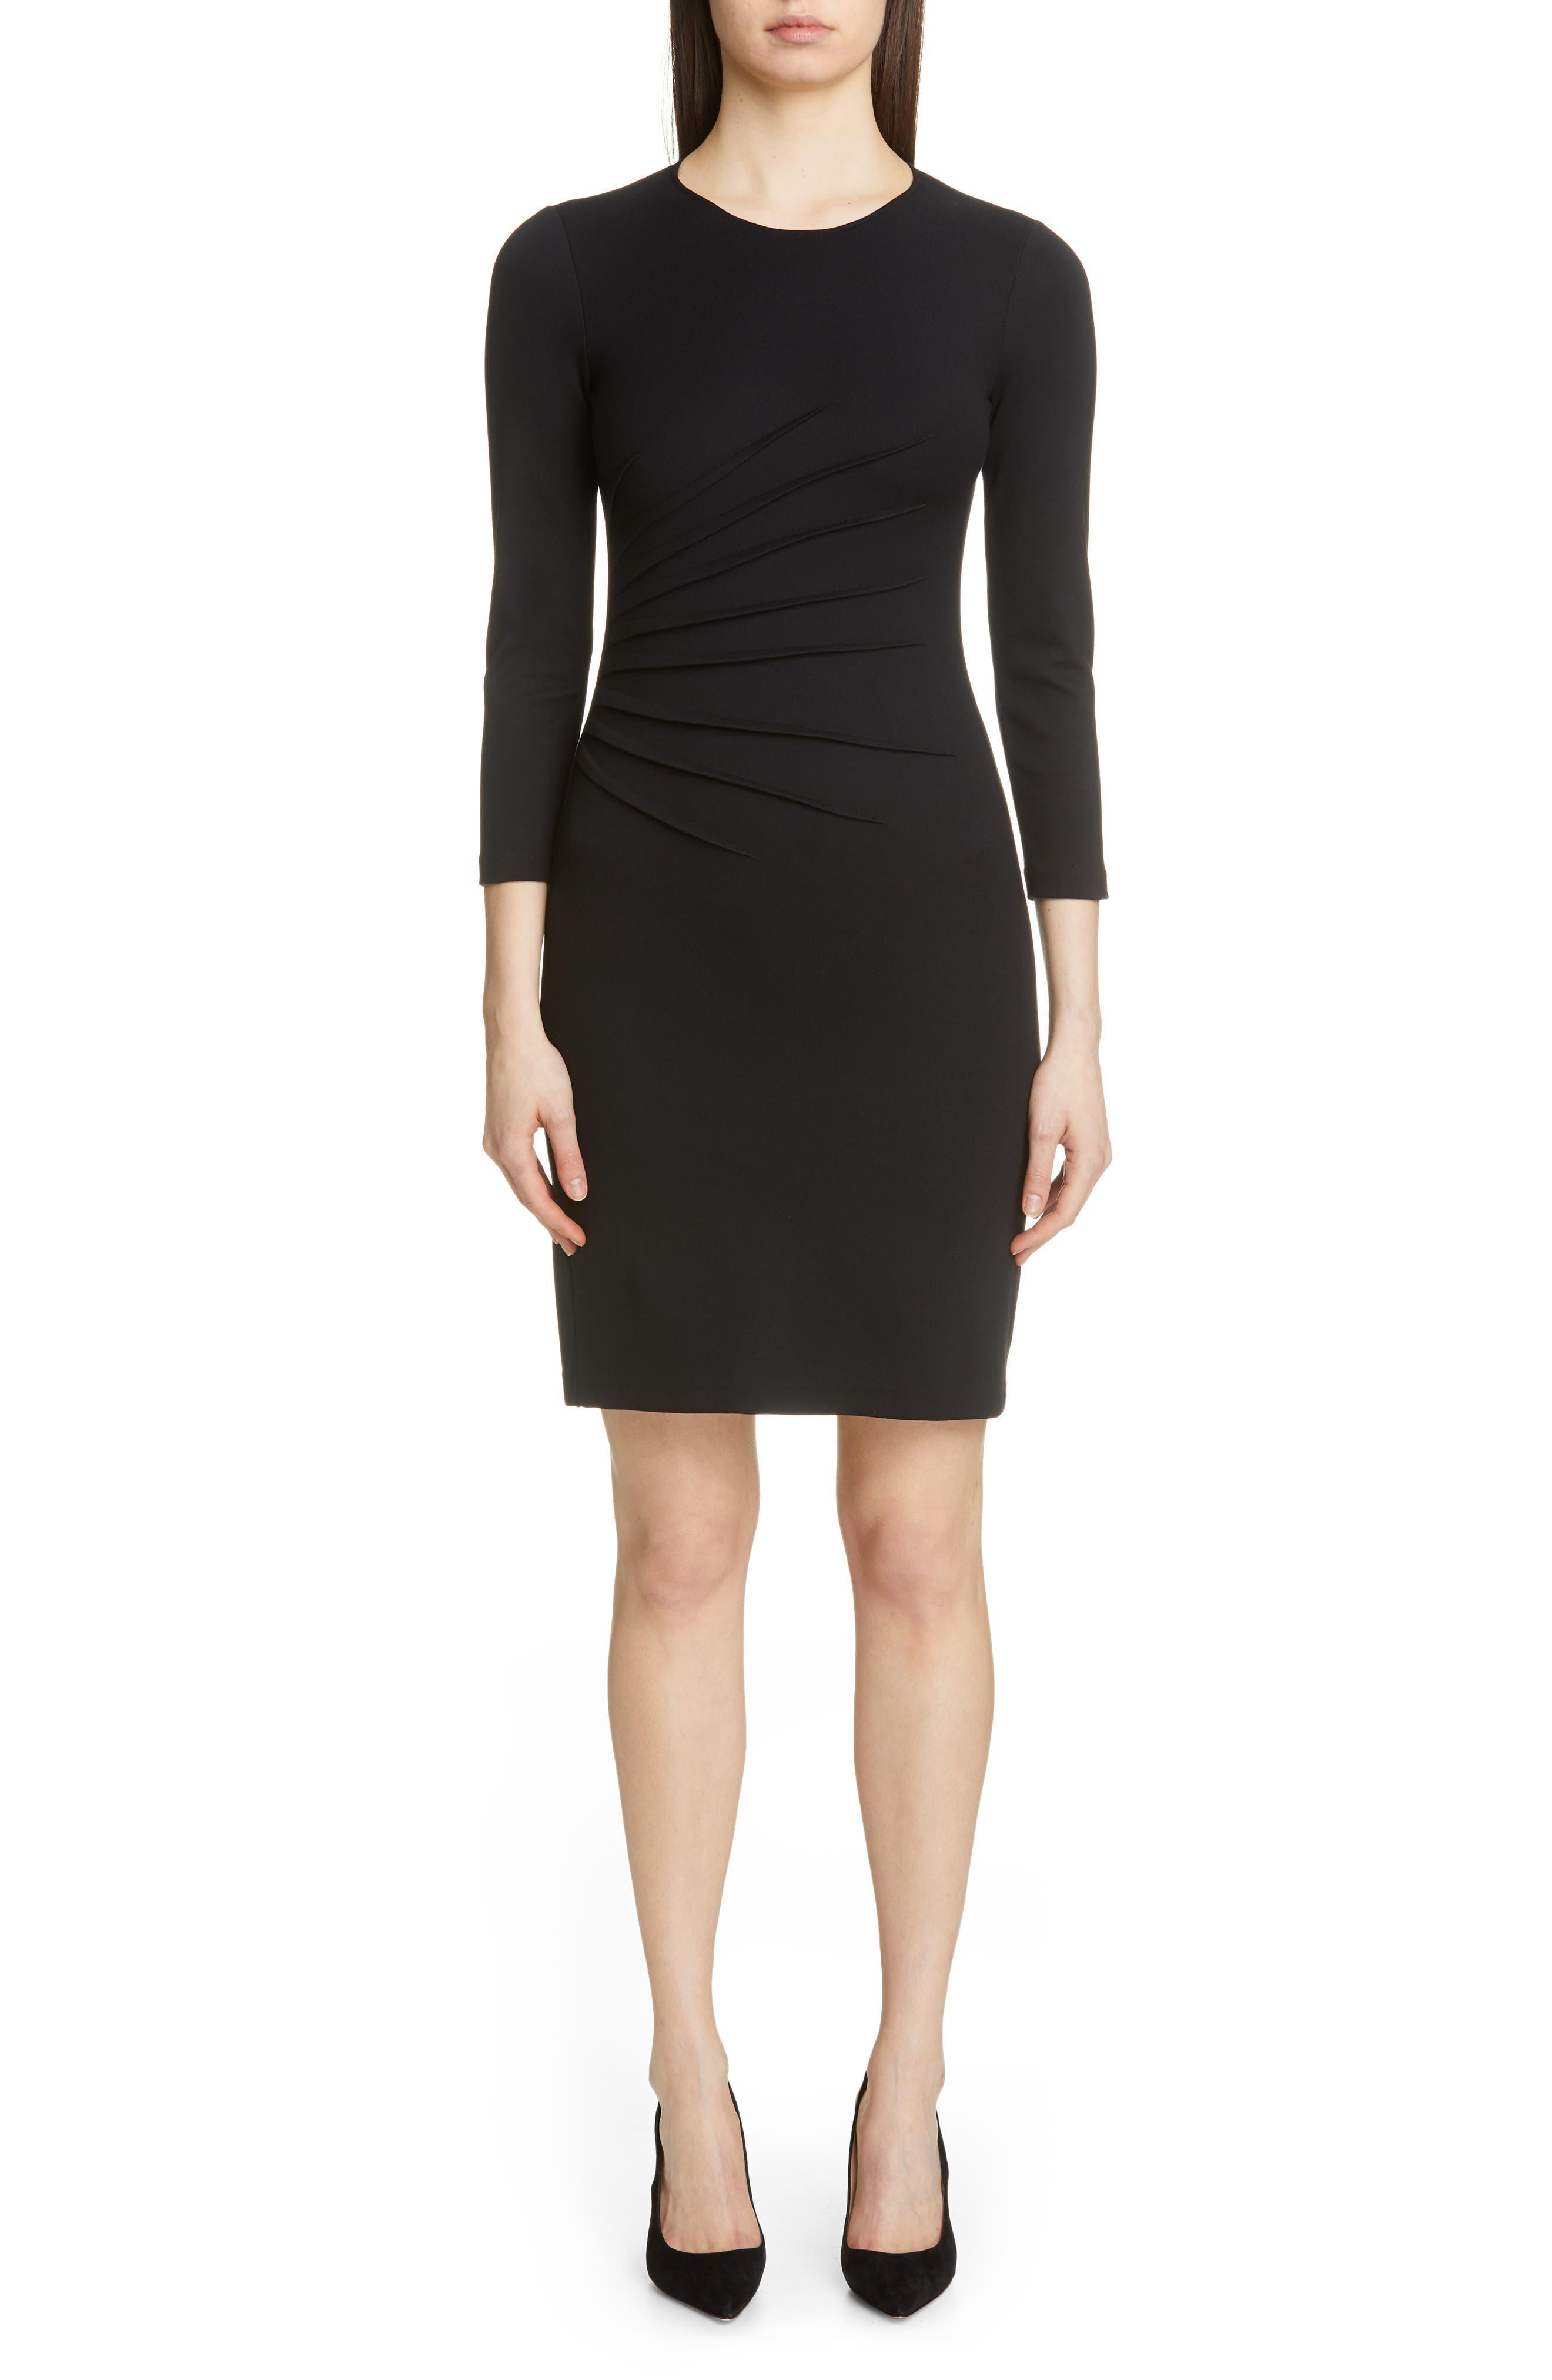 Emporio Armani Dress, US / 42 IT - Black